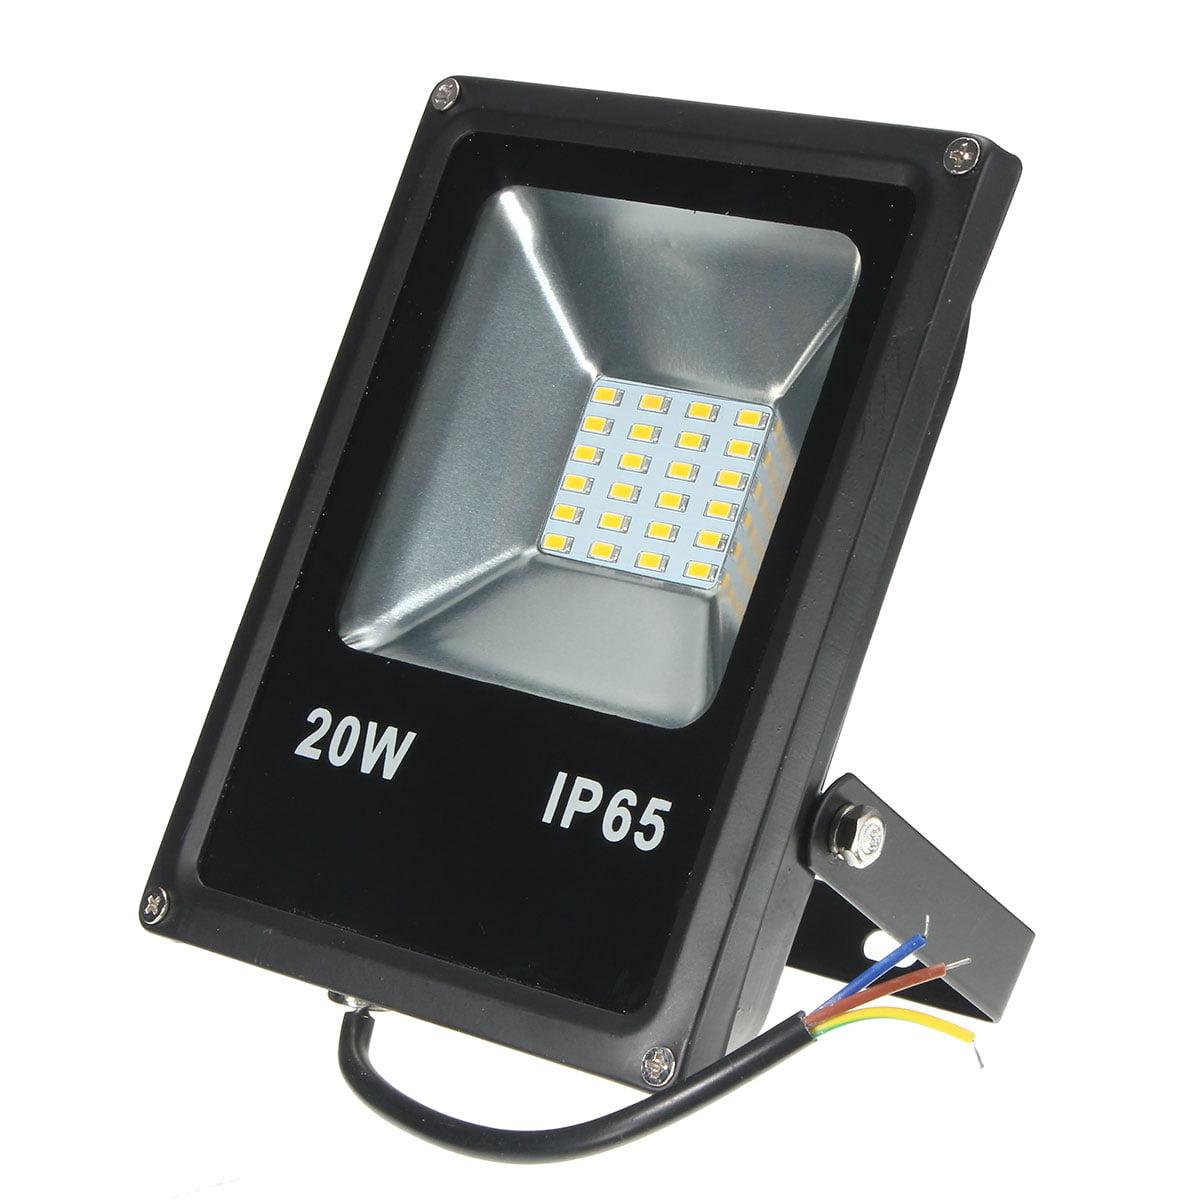 20 Watt LED Flood Light Waterproof Outdoor Garden Yard  Landscape Security Spotlight Equit 100Watt Halogen light